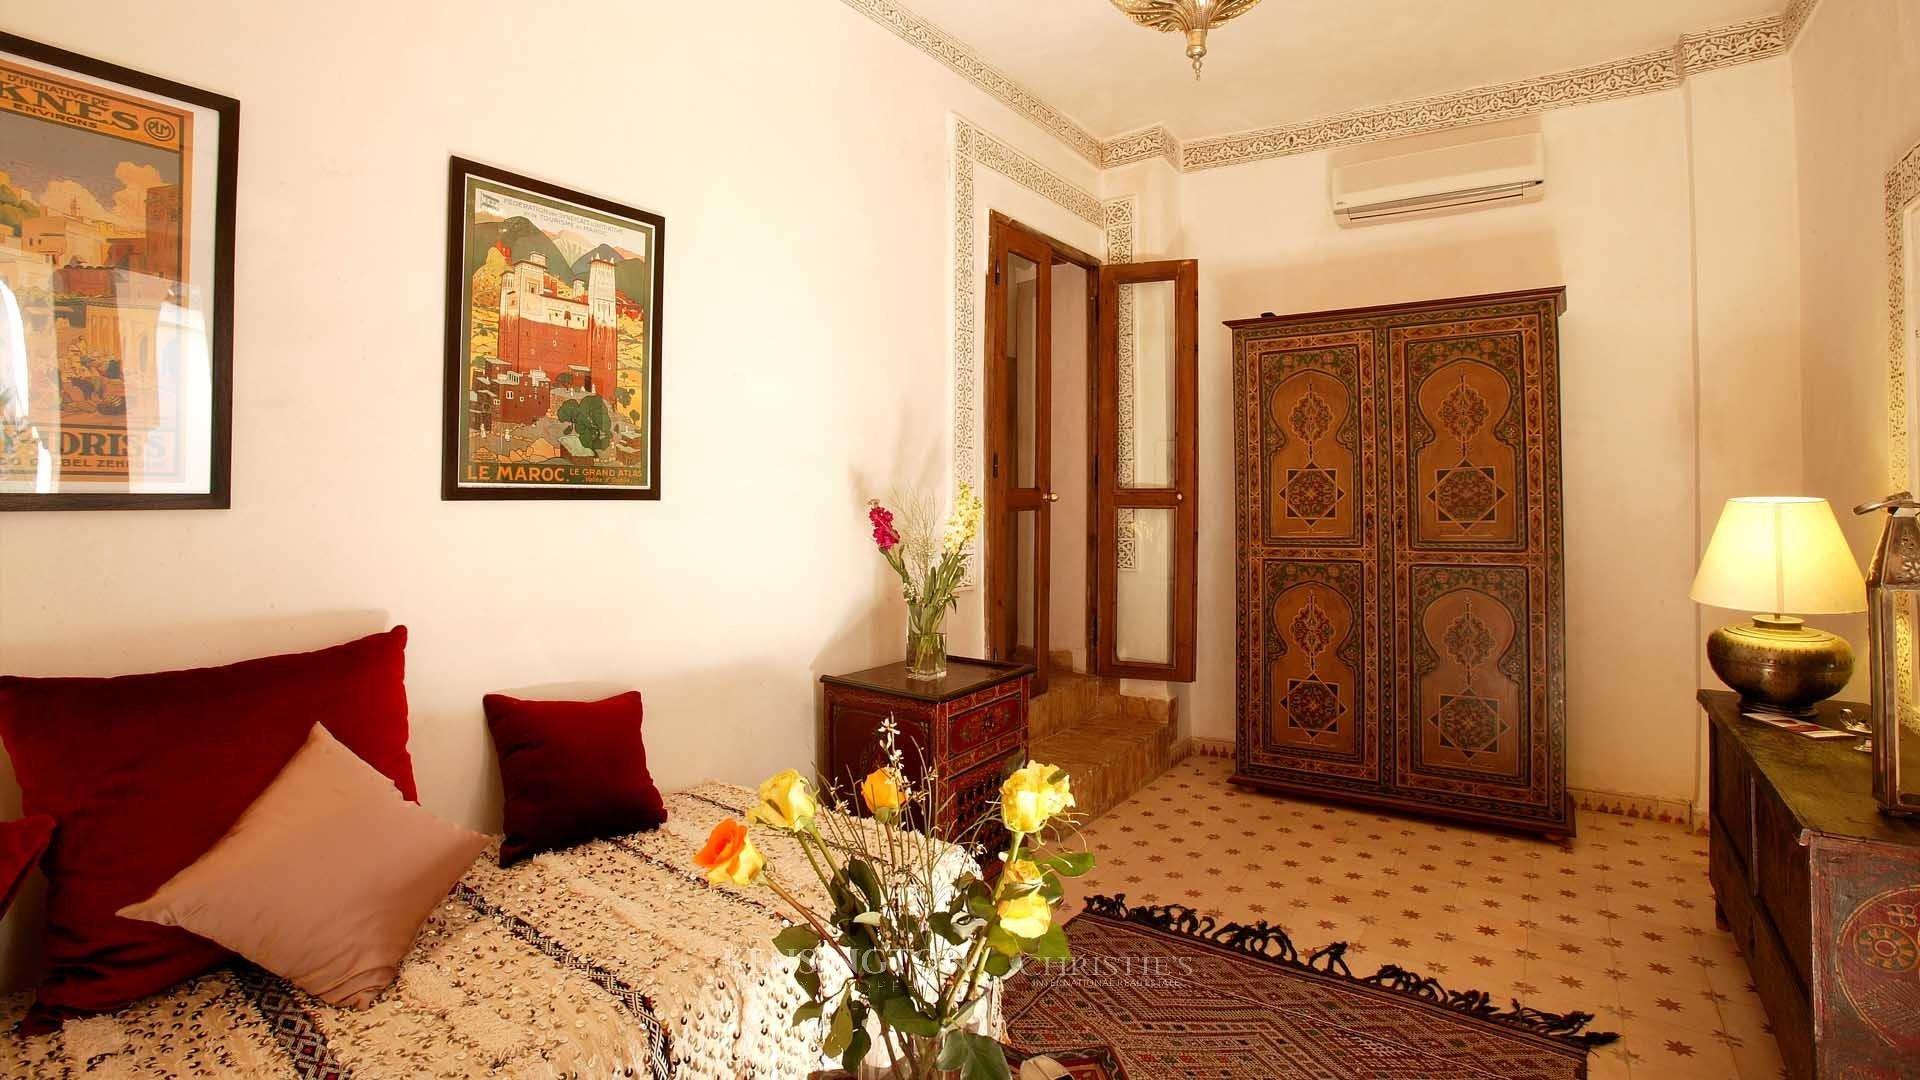 KPPM01268: Riad Addine Riad Marrakech Morocco